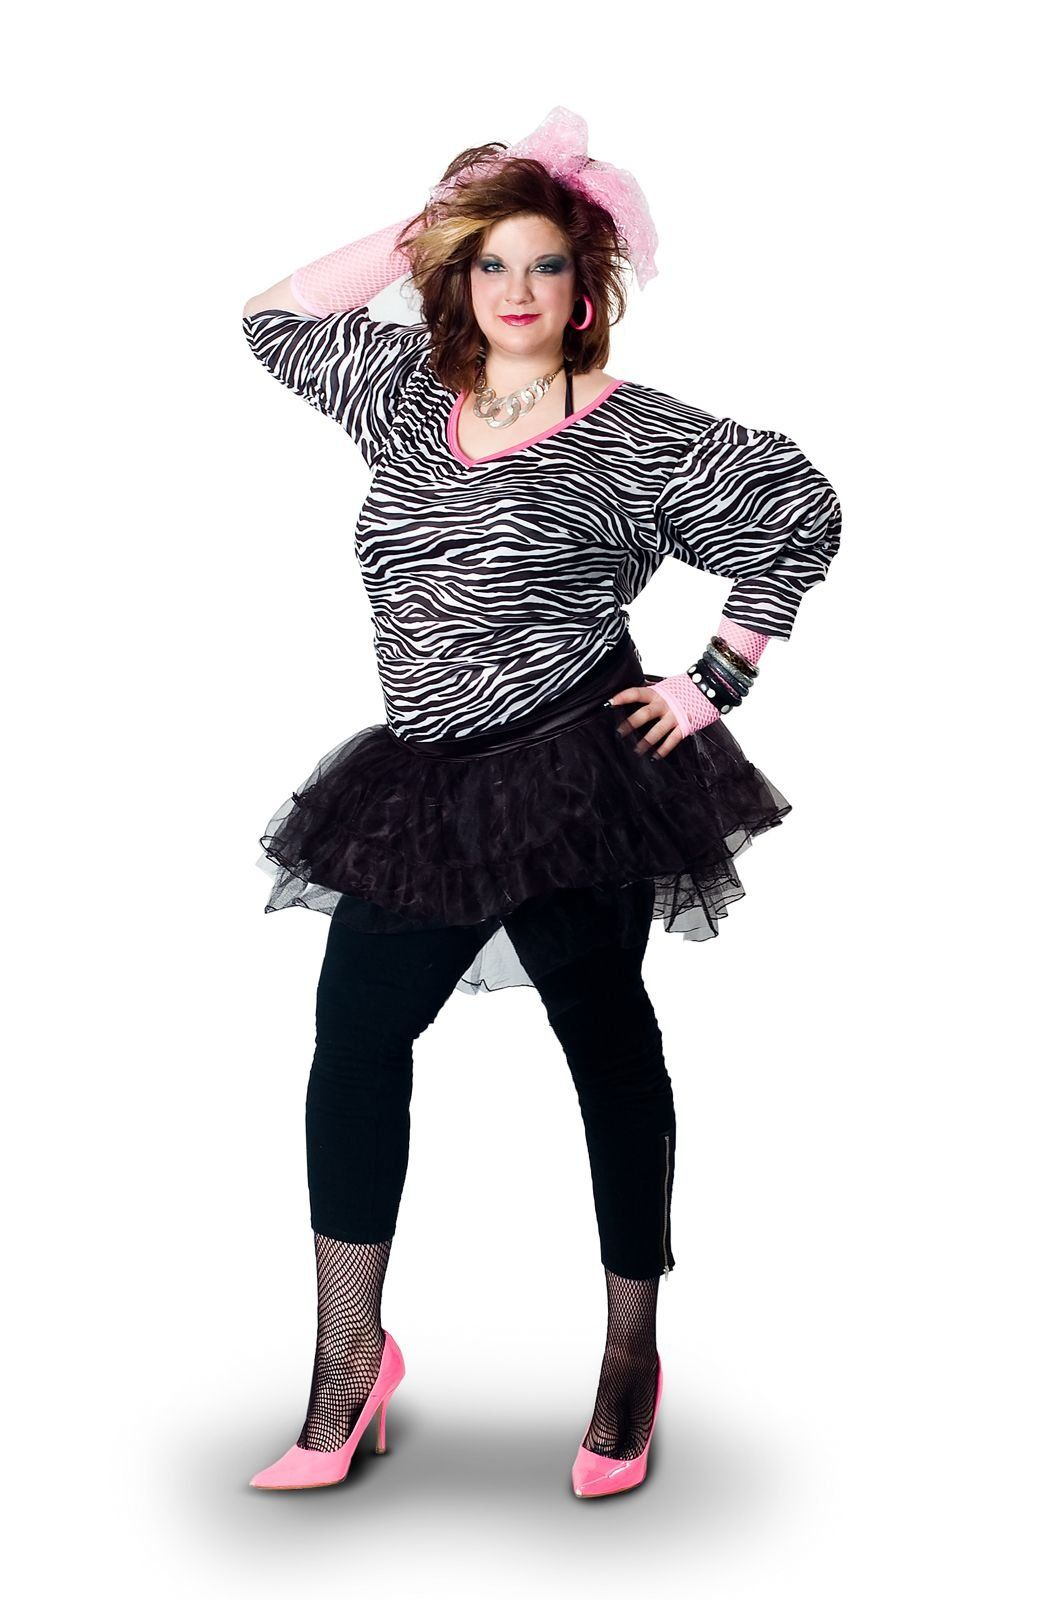 6cc27775f8 Sunnywood Women s Plus-Size Lava Diva Hip Hop 80 s Costume